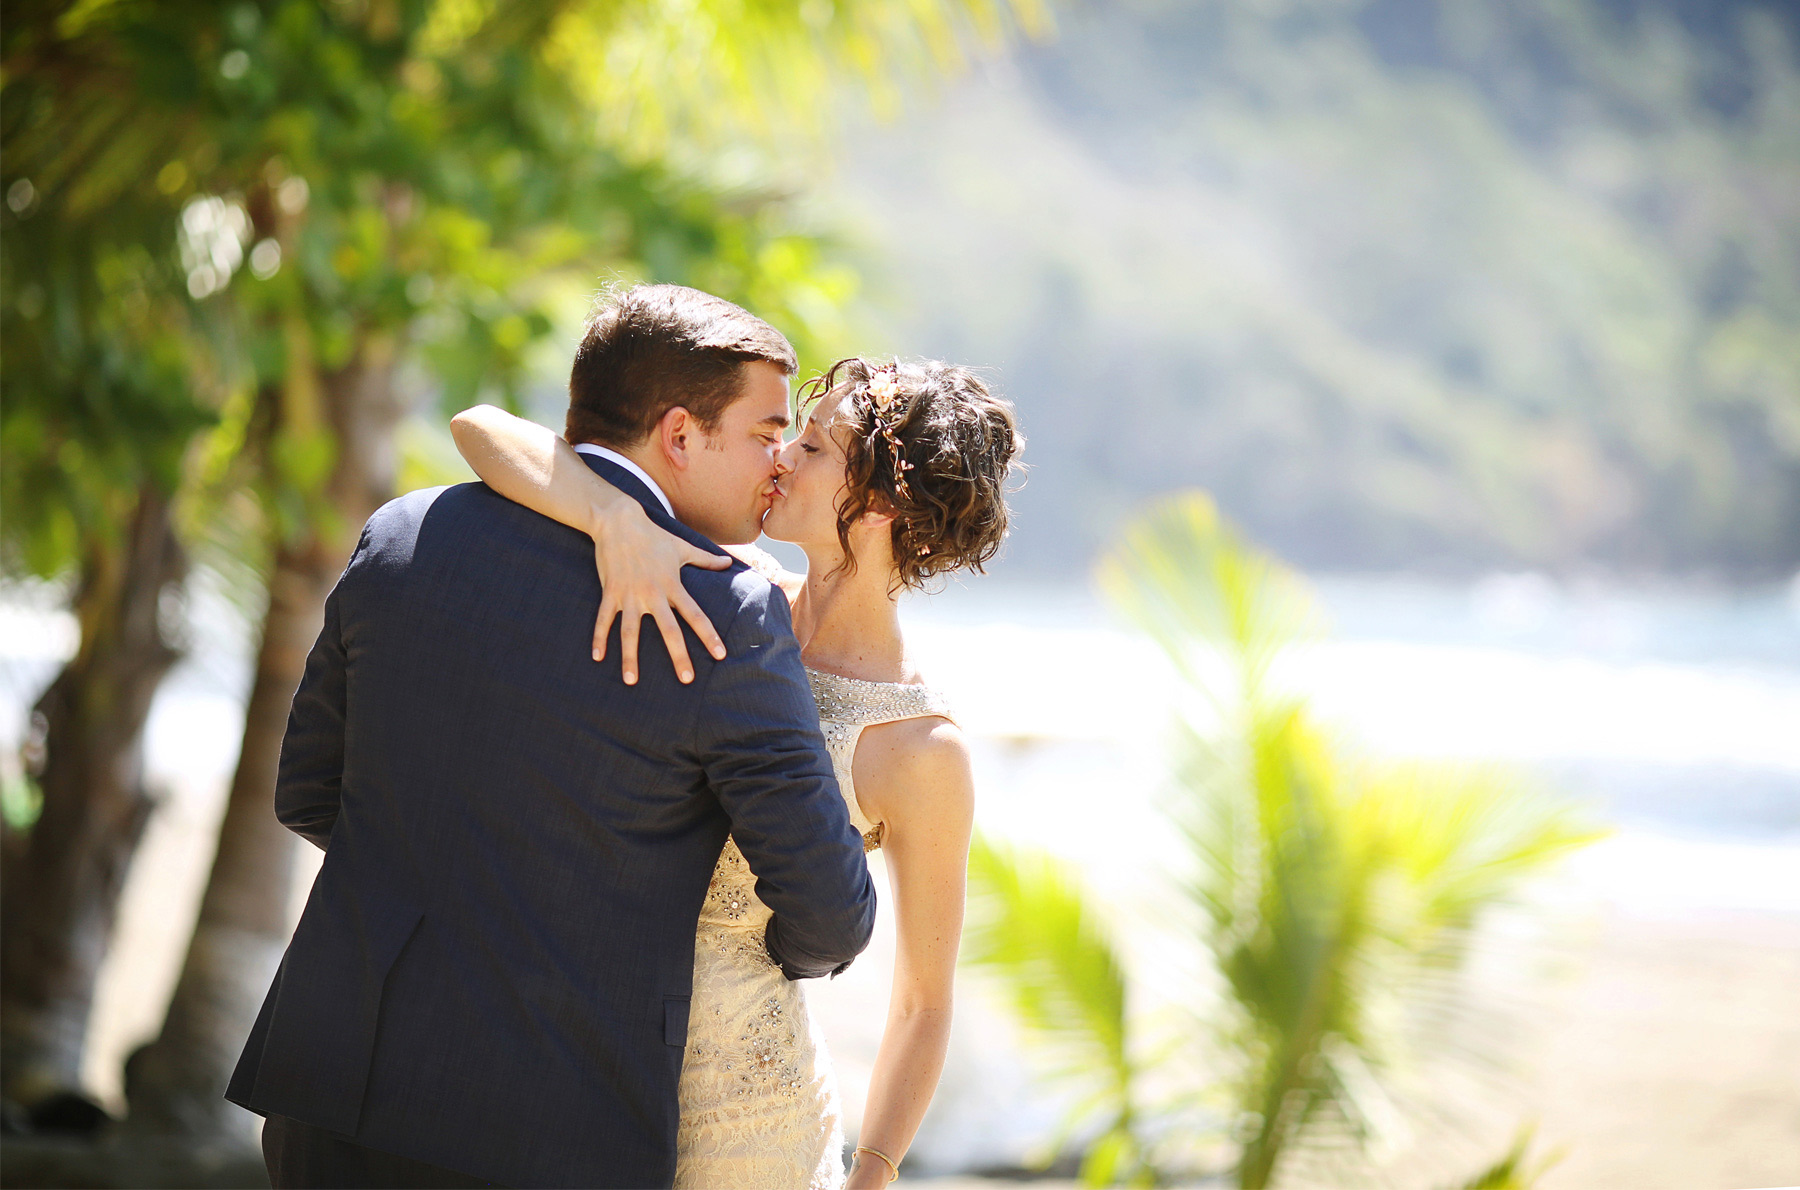 06-Costa-Rica-Wedding-Photography-by-Vick-Photography-Jaco-Tropical-Beach-Villa-Caletas-Resort-Alli-and-Duncan.jpg